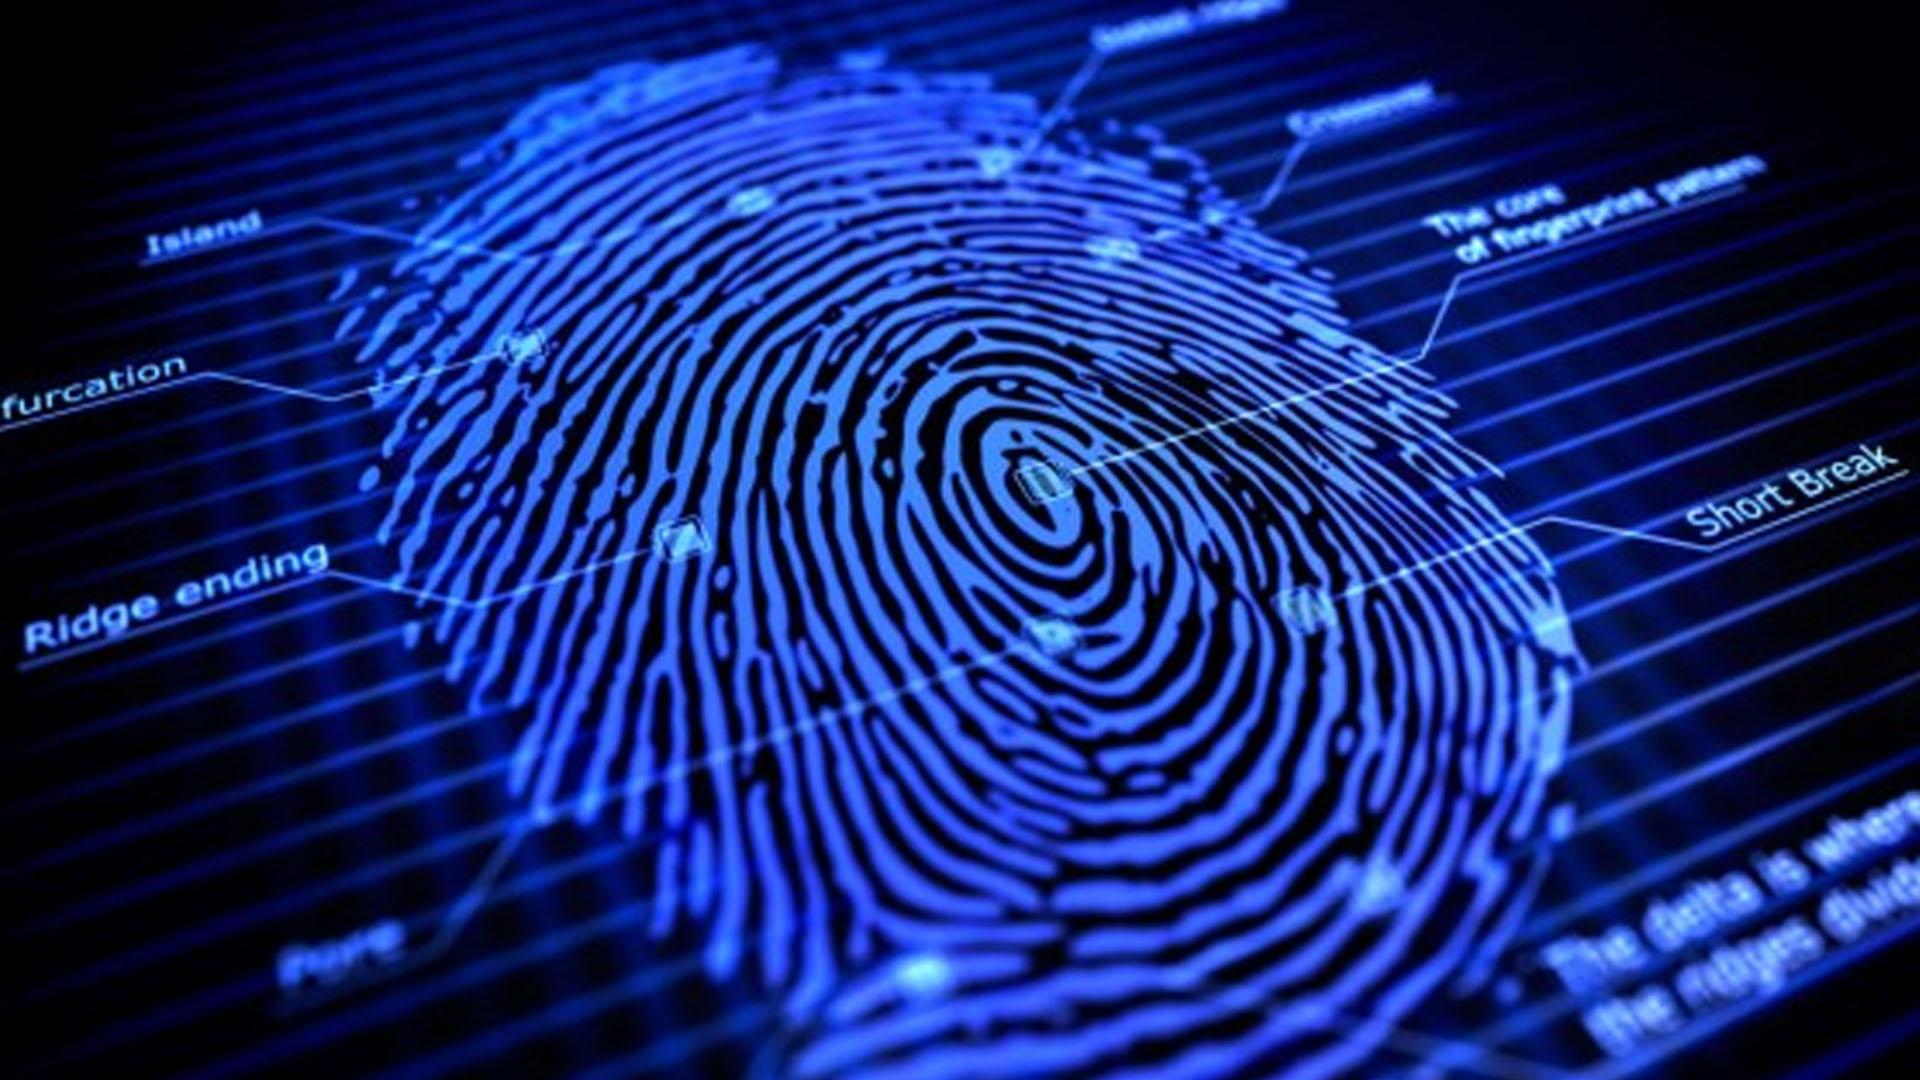 3 Vantagens do Controle de Acesso Biométrico